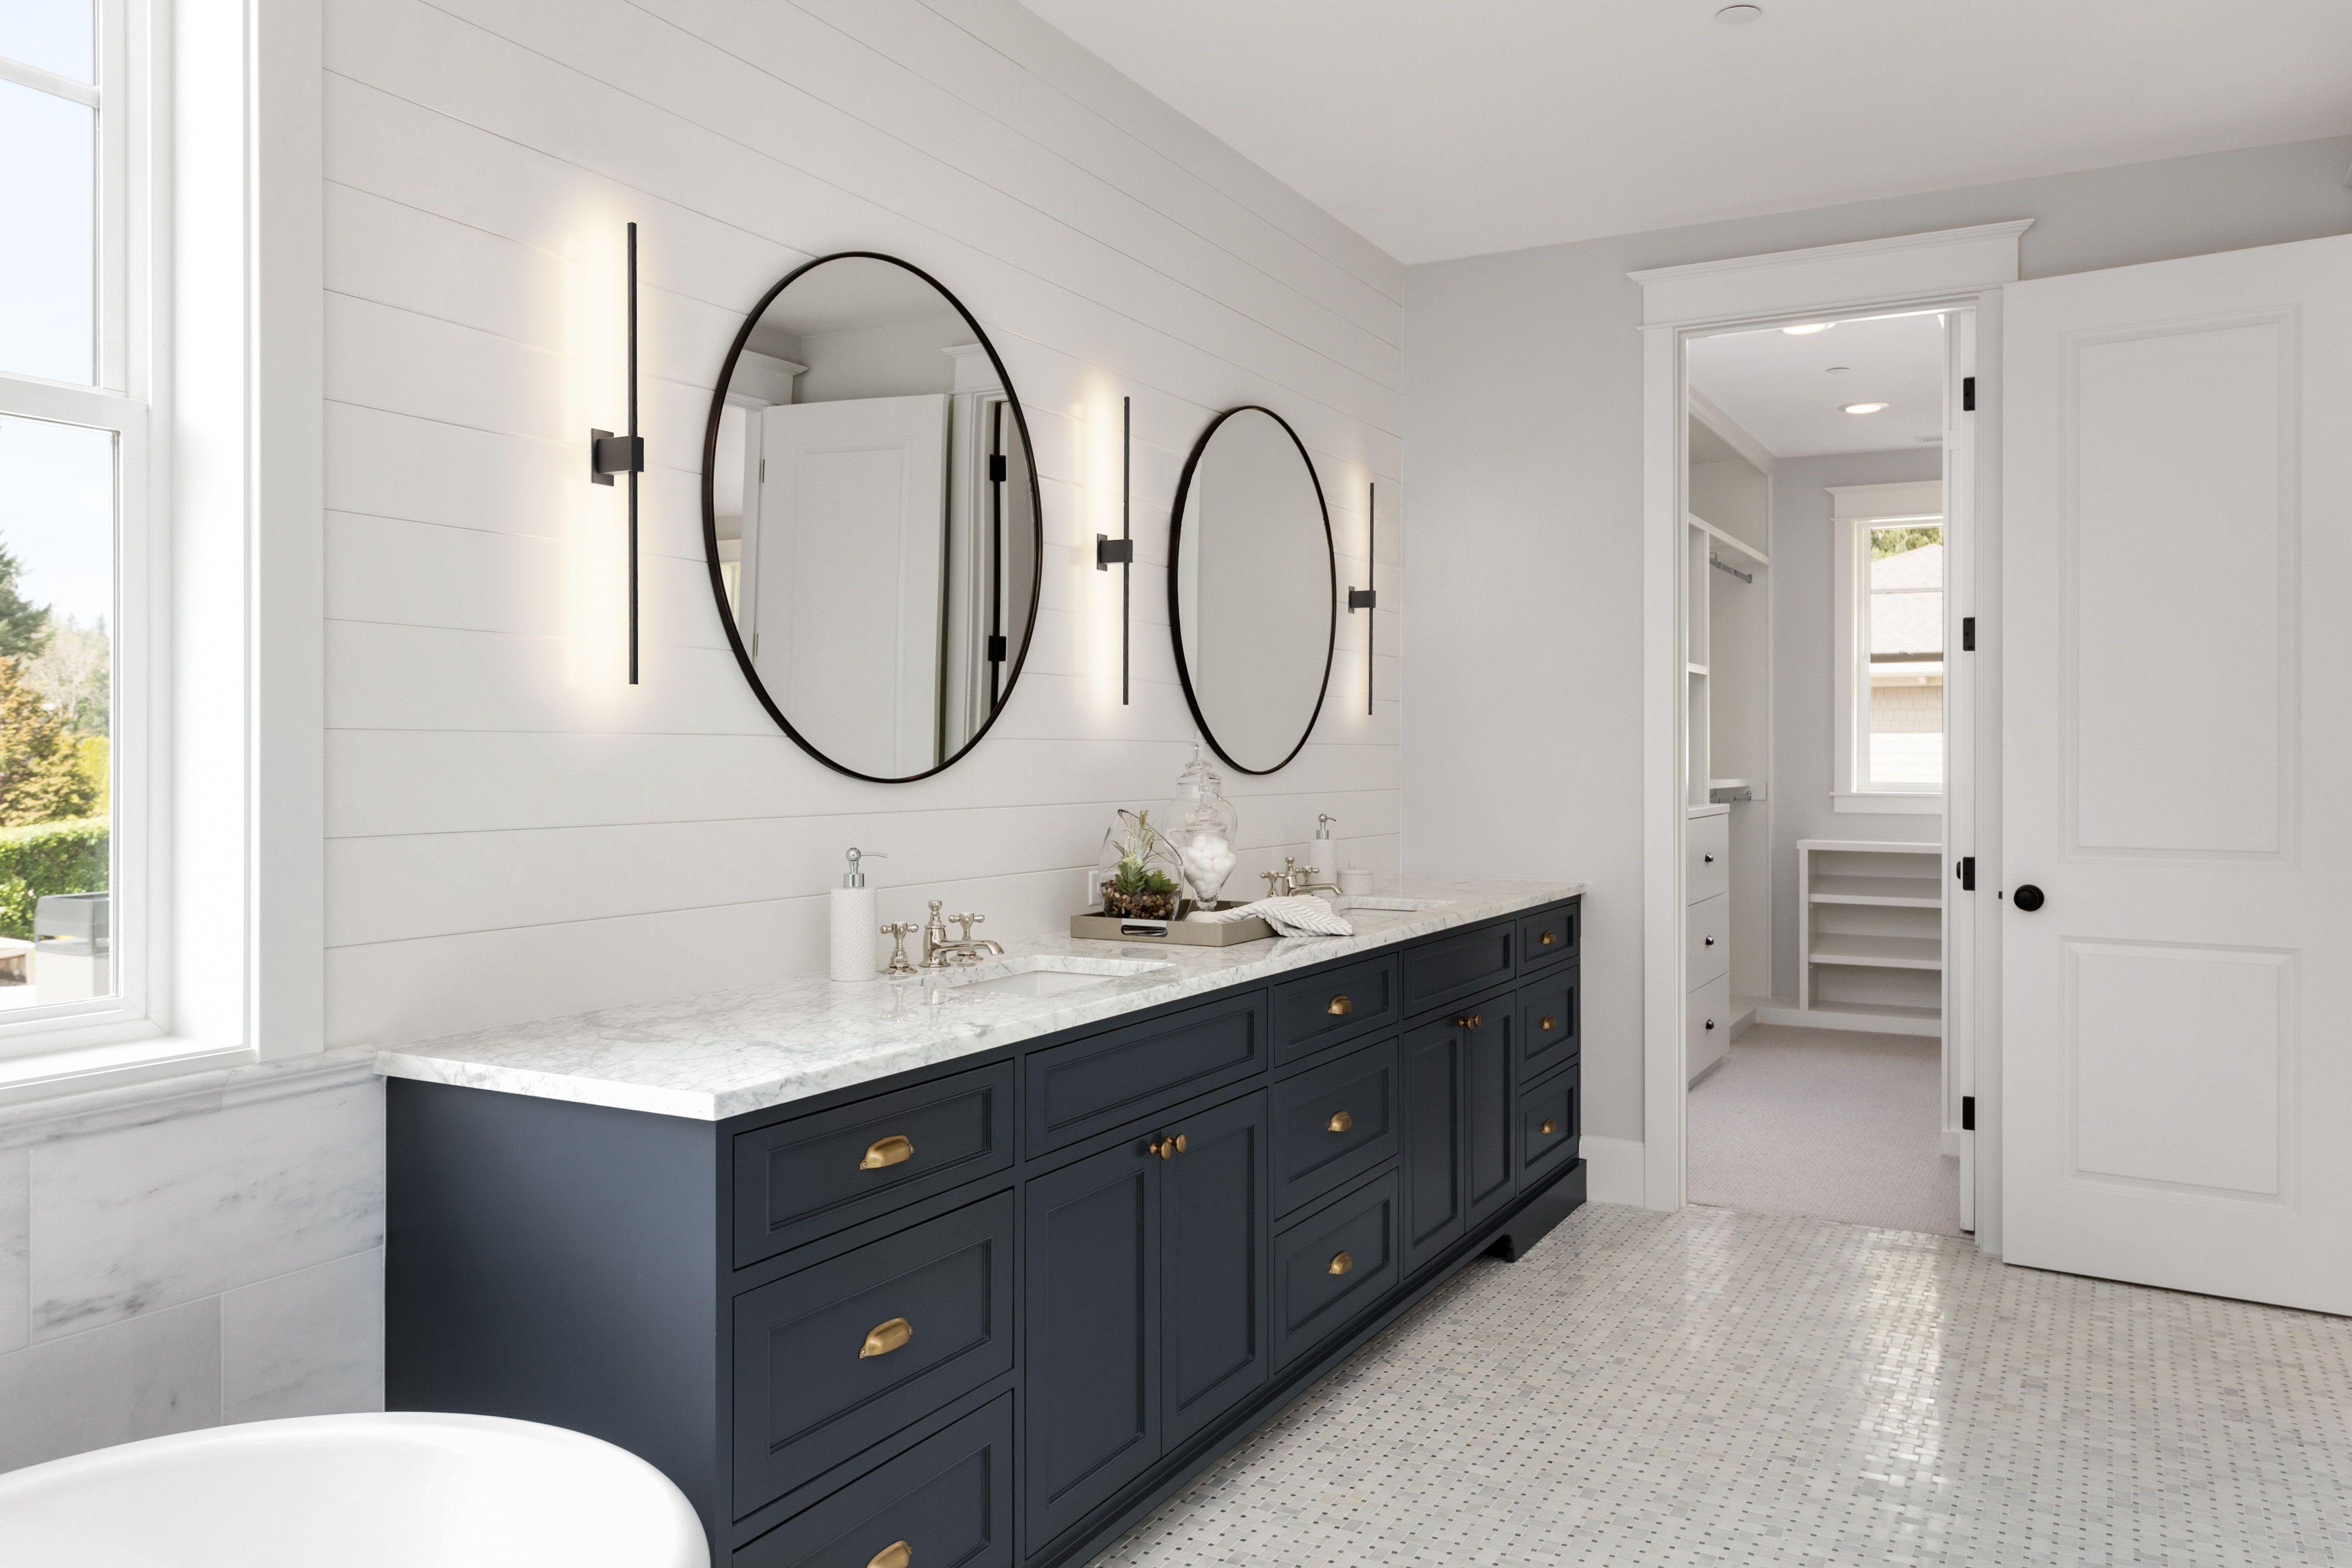 Dailyproductpick The Z Bar Wall Sconce By Koncept Is A Sleek And Slim Rotatable Led Bar Utilized To H Blue Bathroom Vanity Wood Floor Bathroom Bathroom Mirror